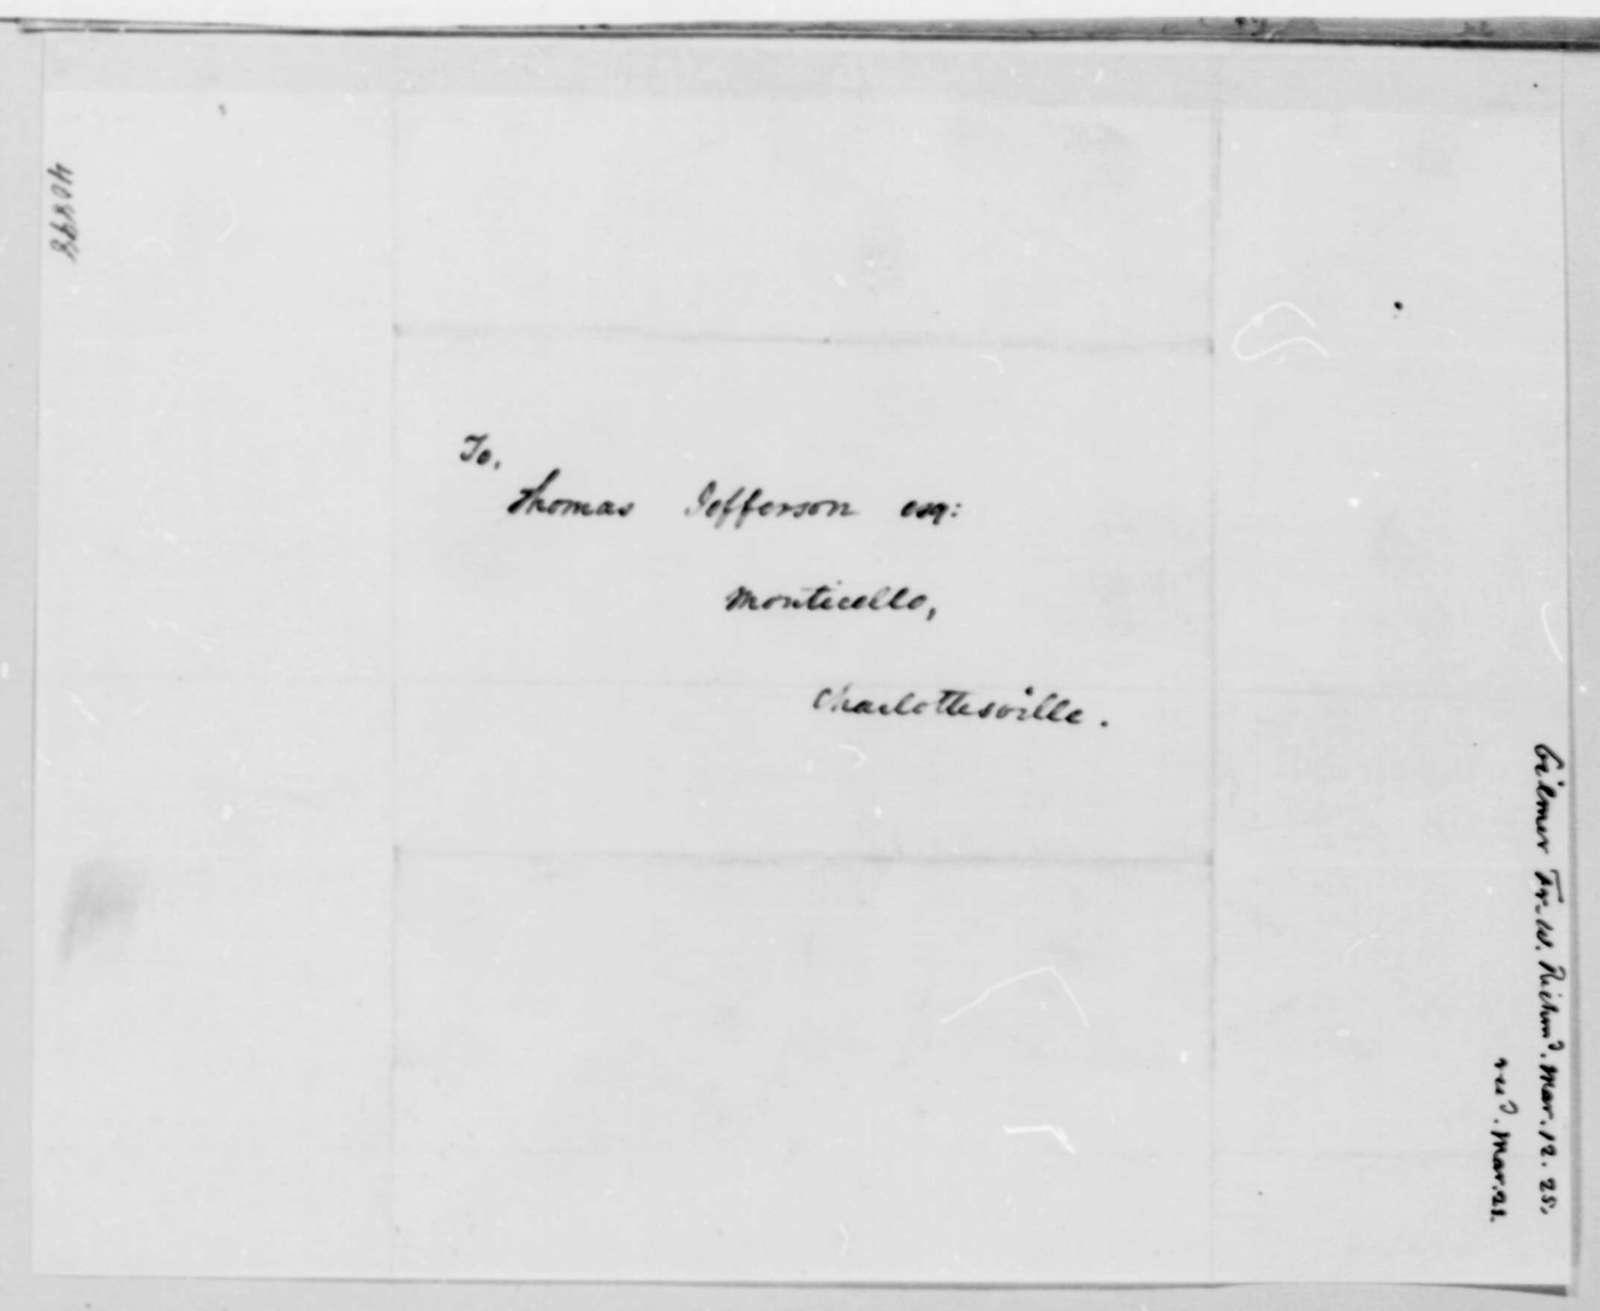 Francis W. Gilmer to Thomas Jefferson, March 12, 1825